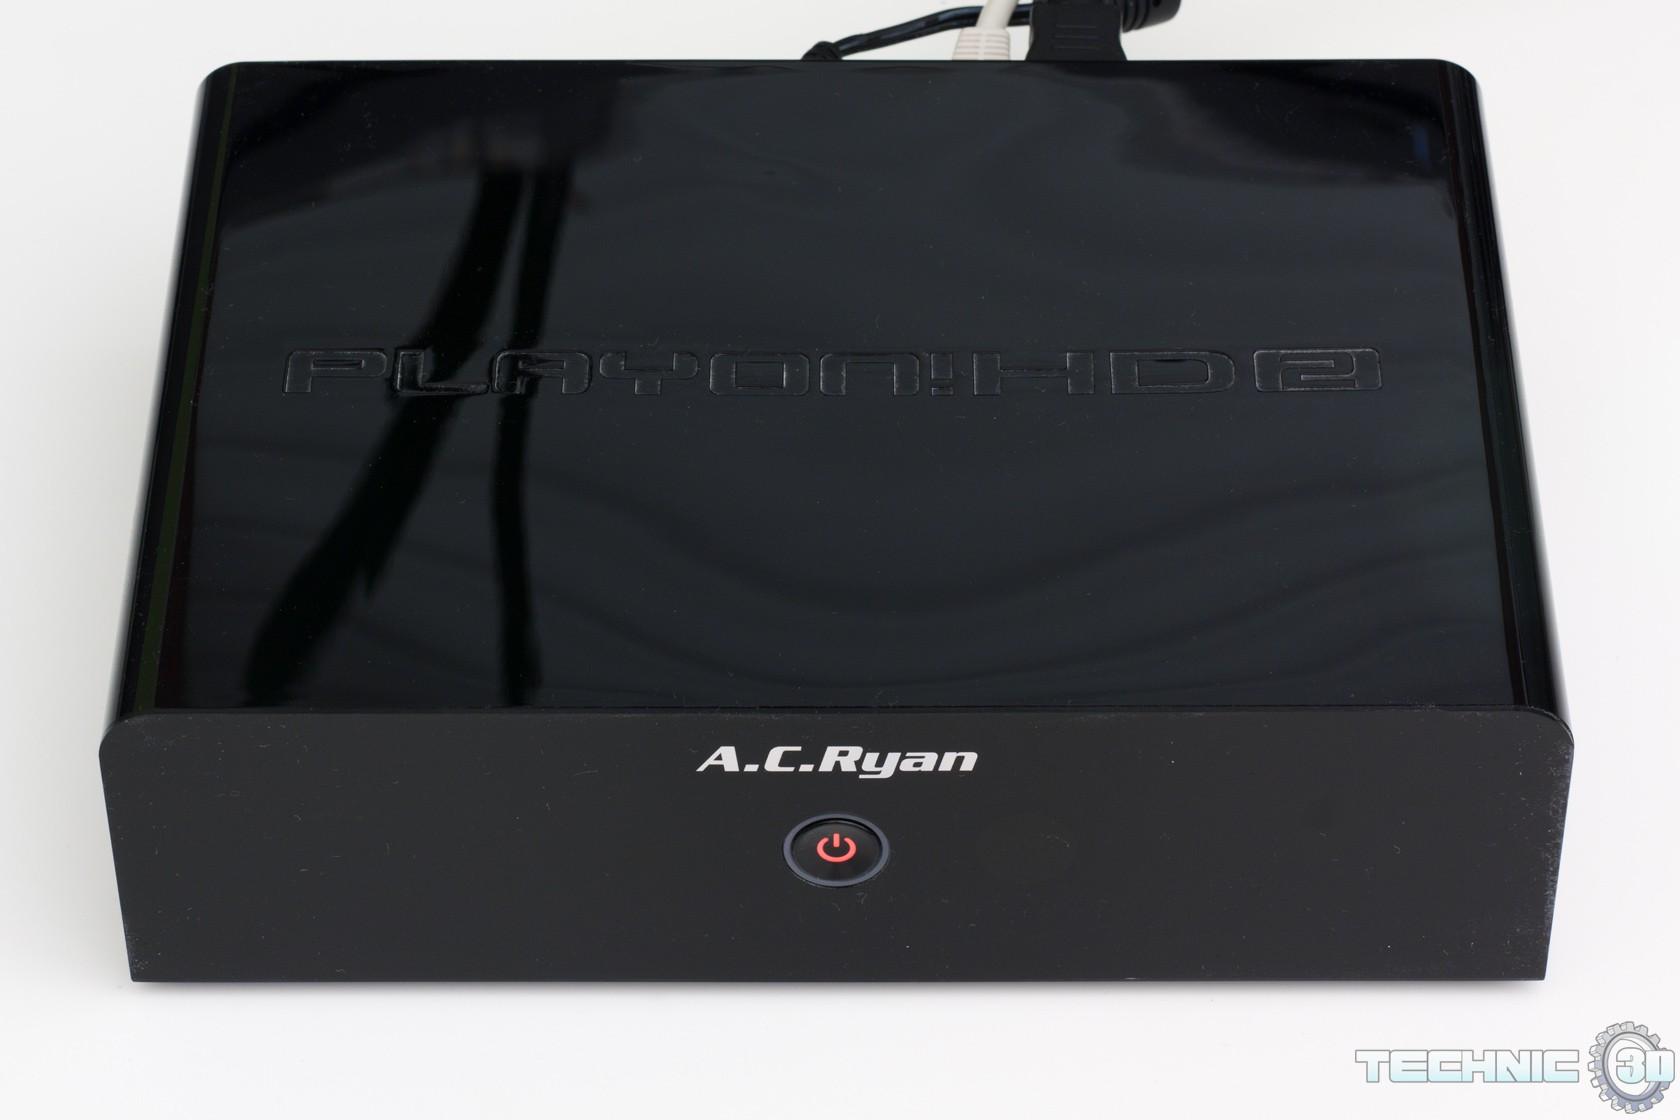 ac ryan playon hd2 update firmware